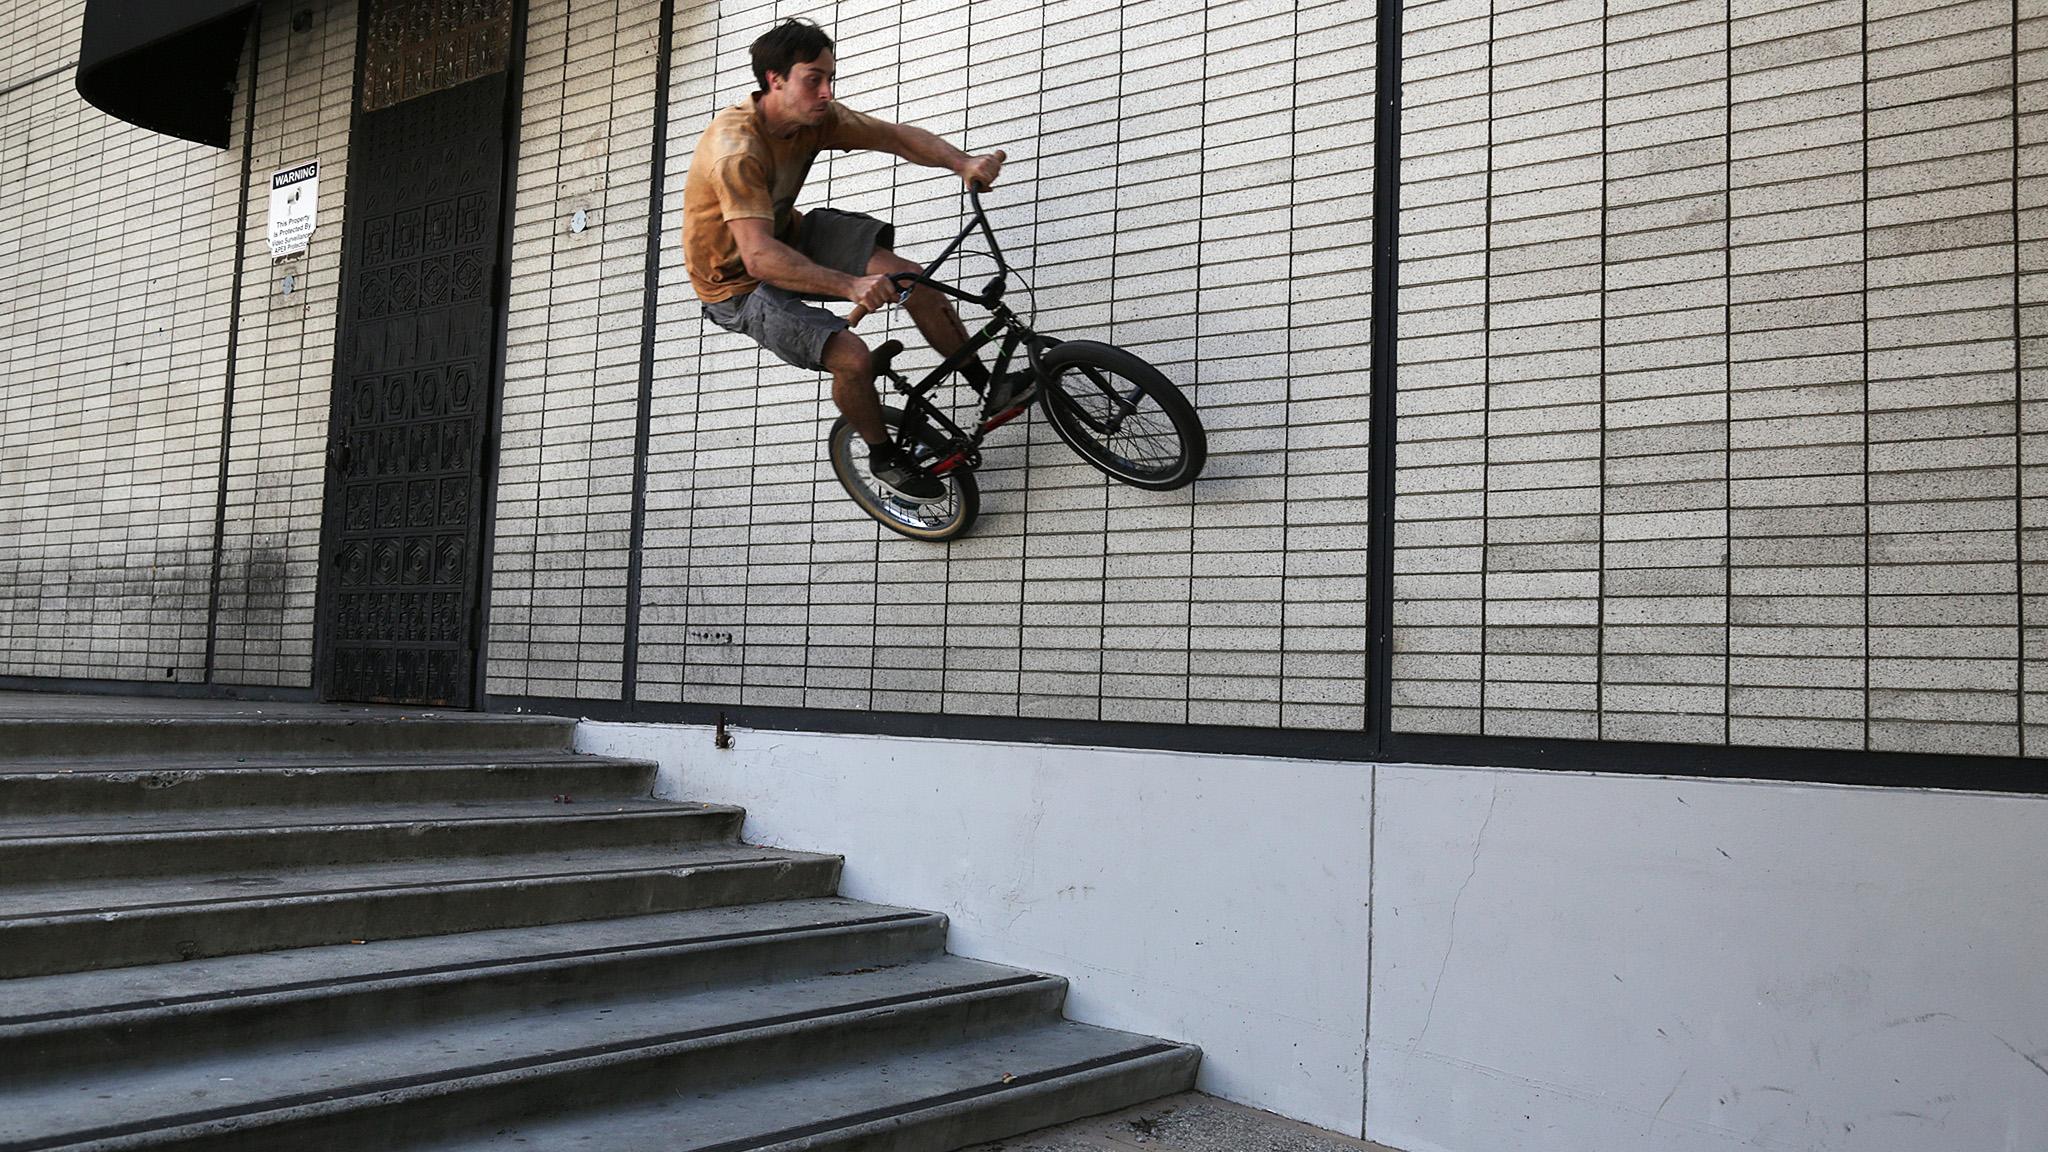 Random wall ride